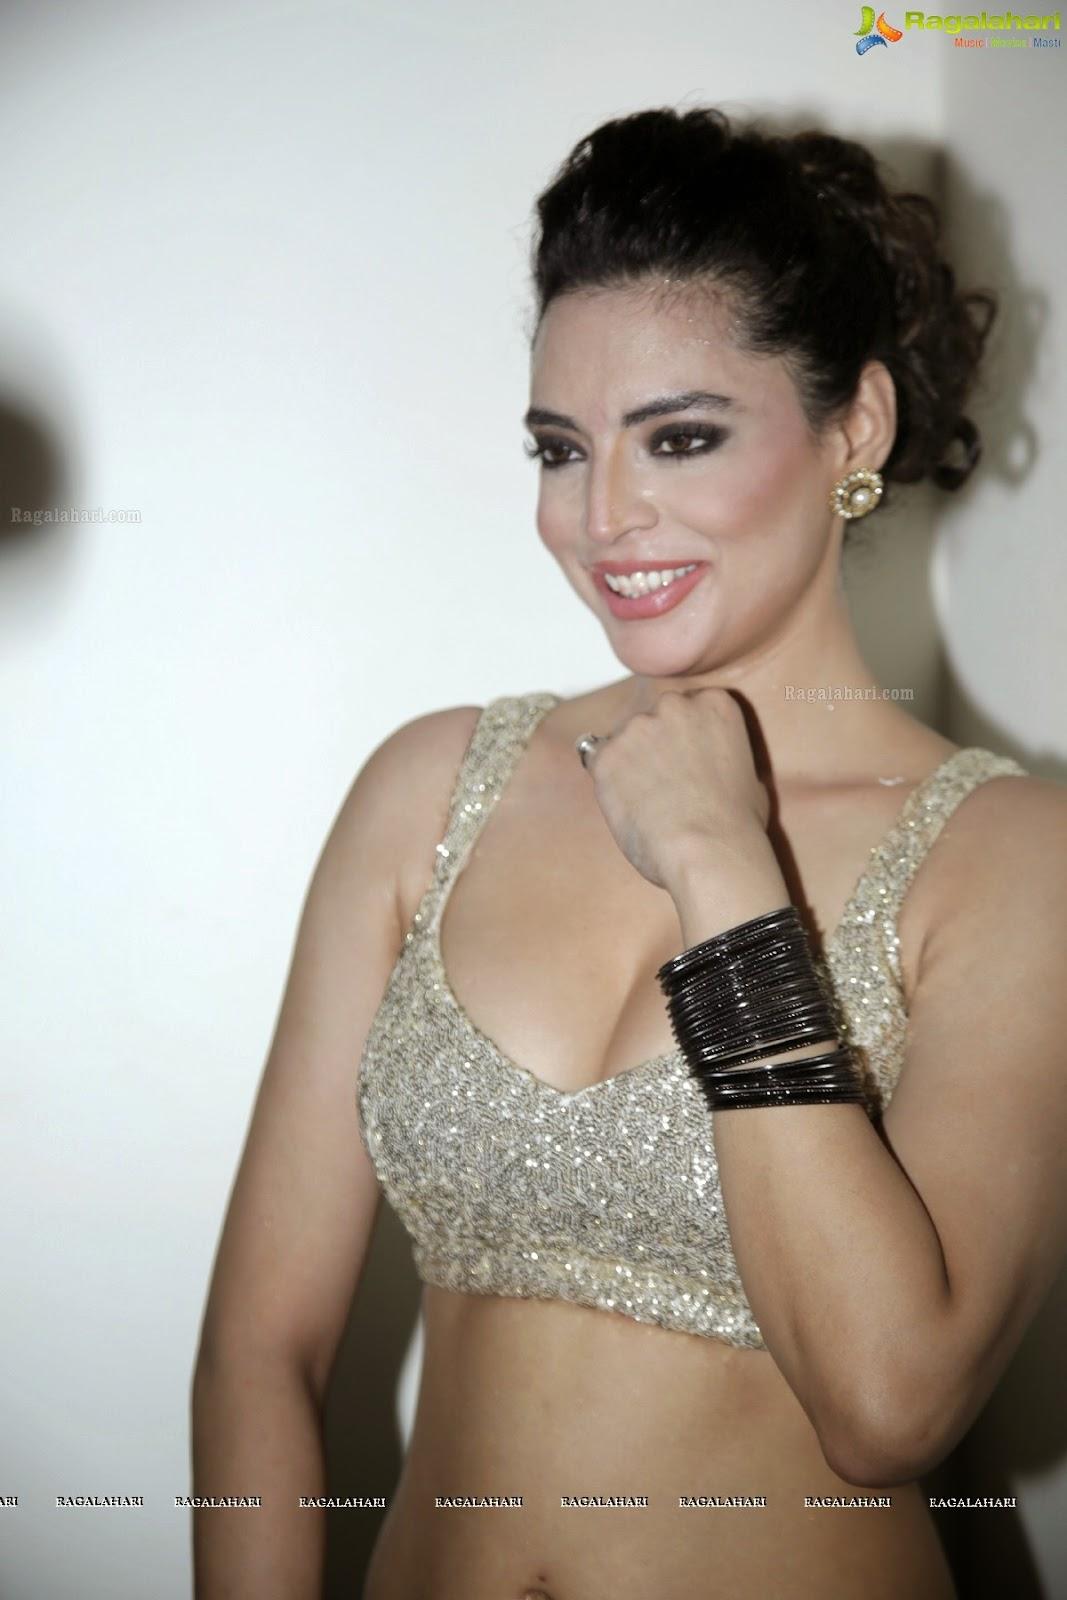 Shweta Bhardwaj nudes (97 photos), Ass, Fappening, Boobs, braless 2018